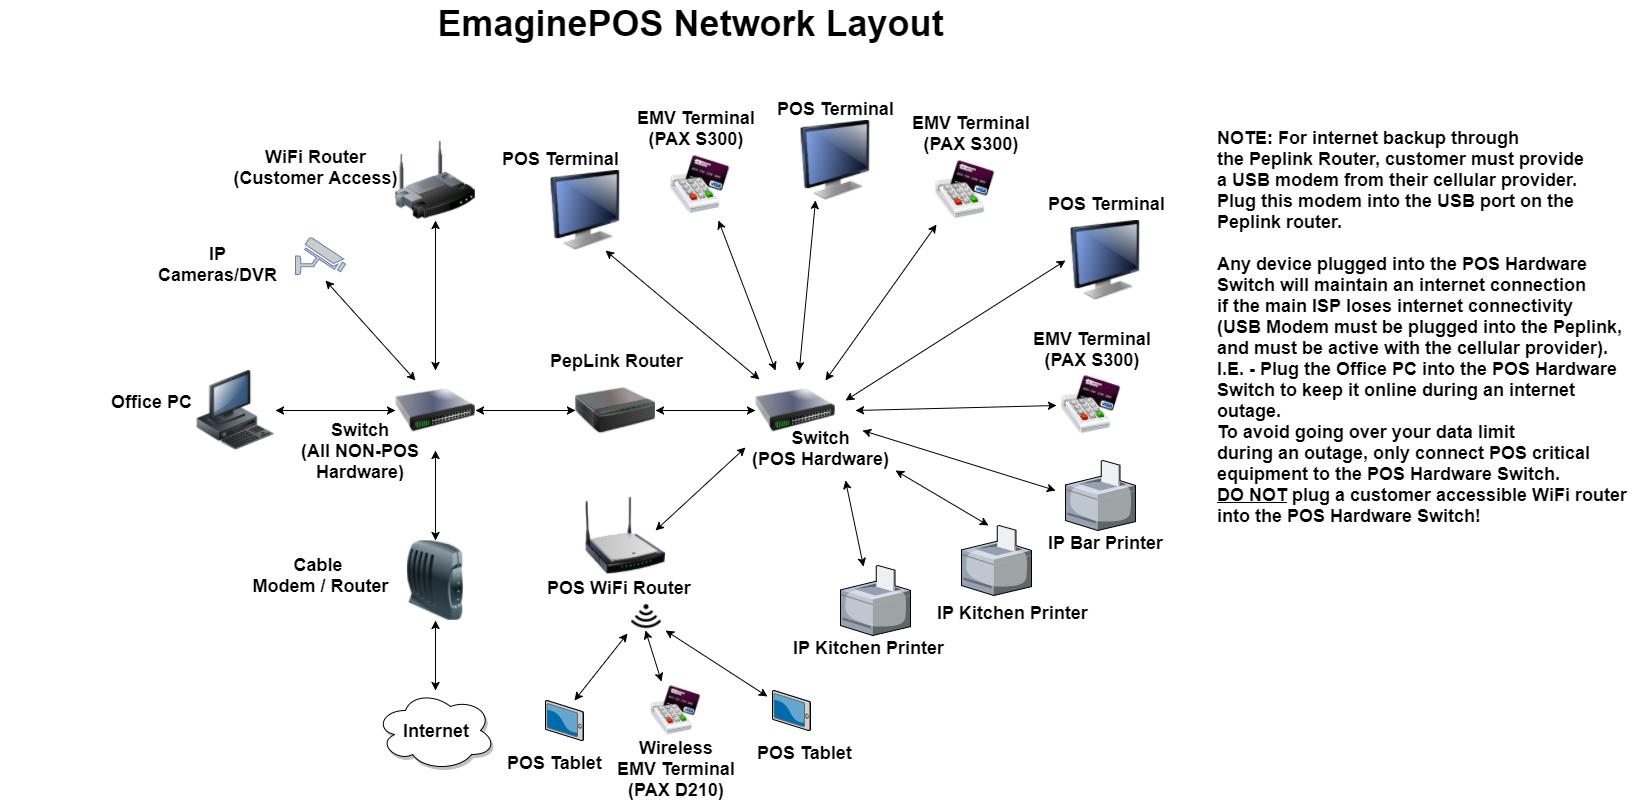 Network Diagram / Wiring Diagram - Emaginepos Help Docs - Network Wiring Diagram